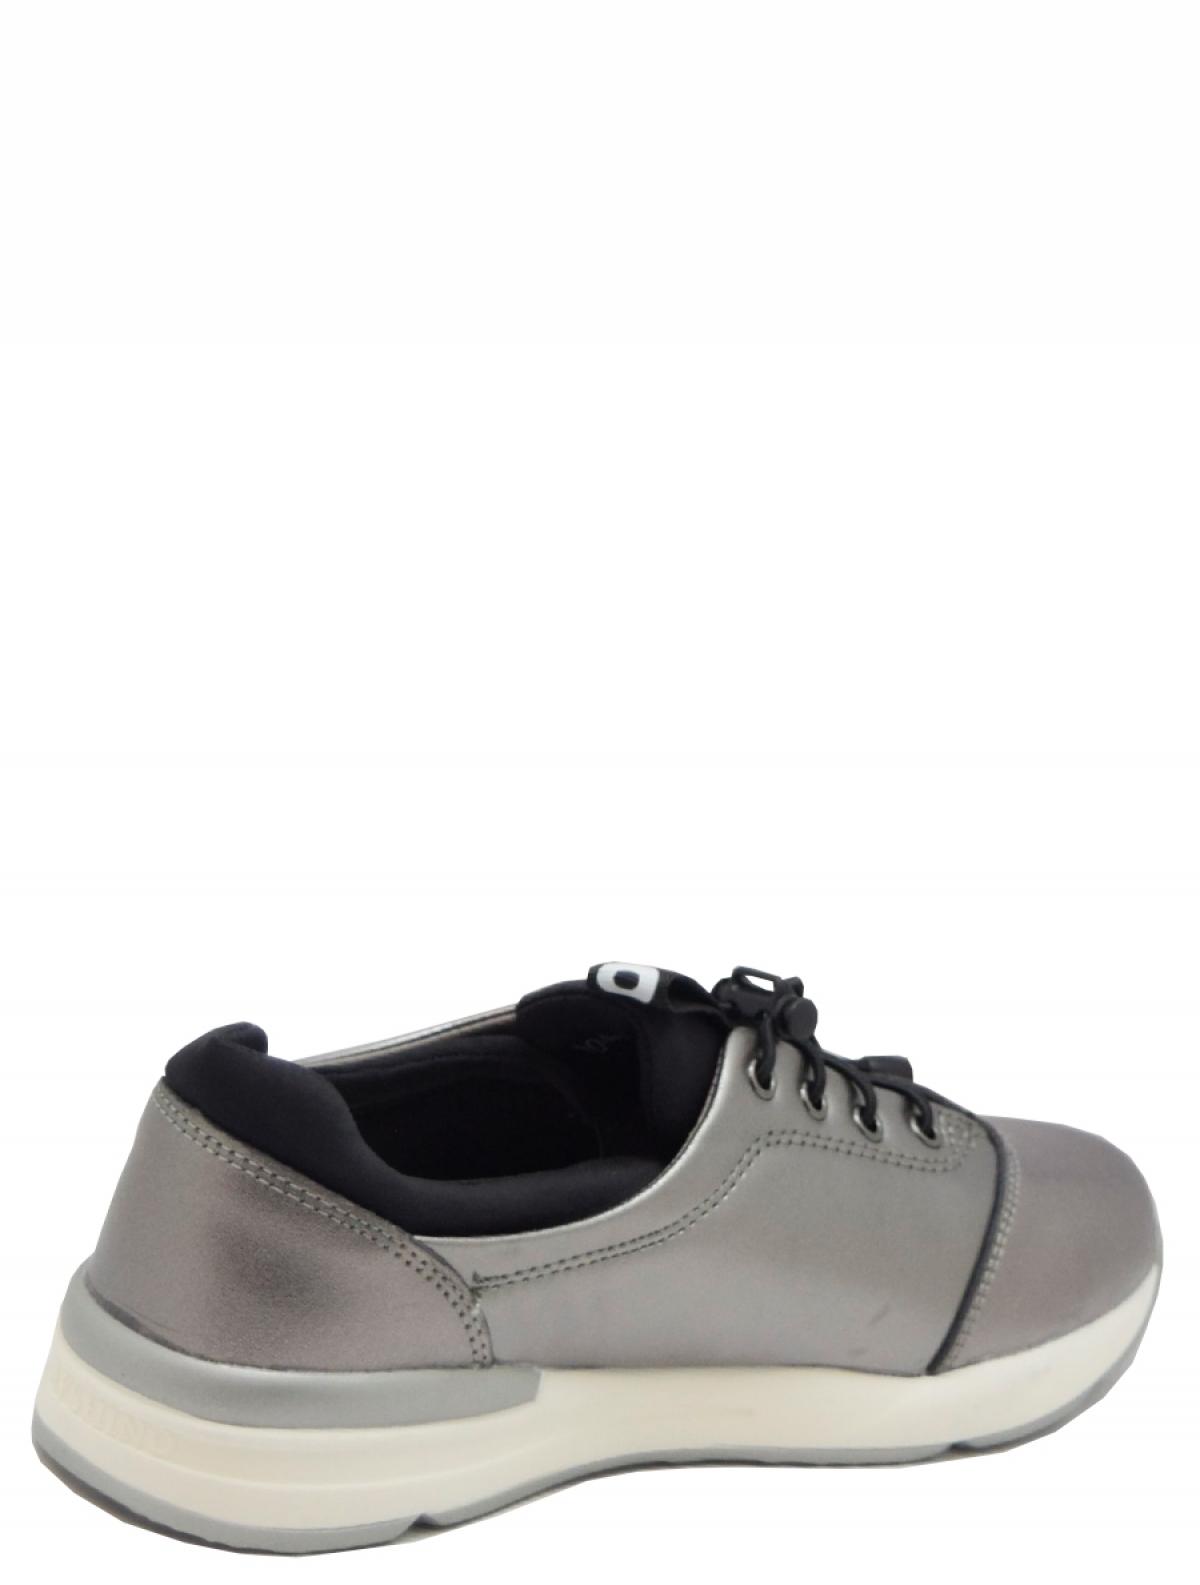 A-B04-78-B кроссовки для девочки